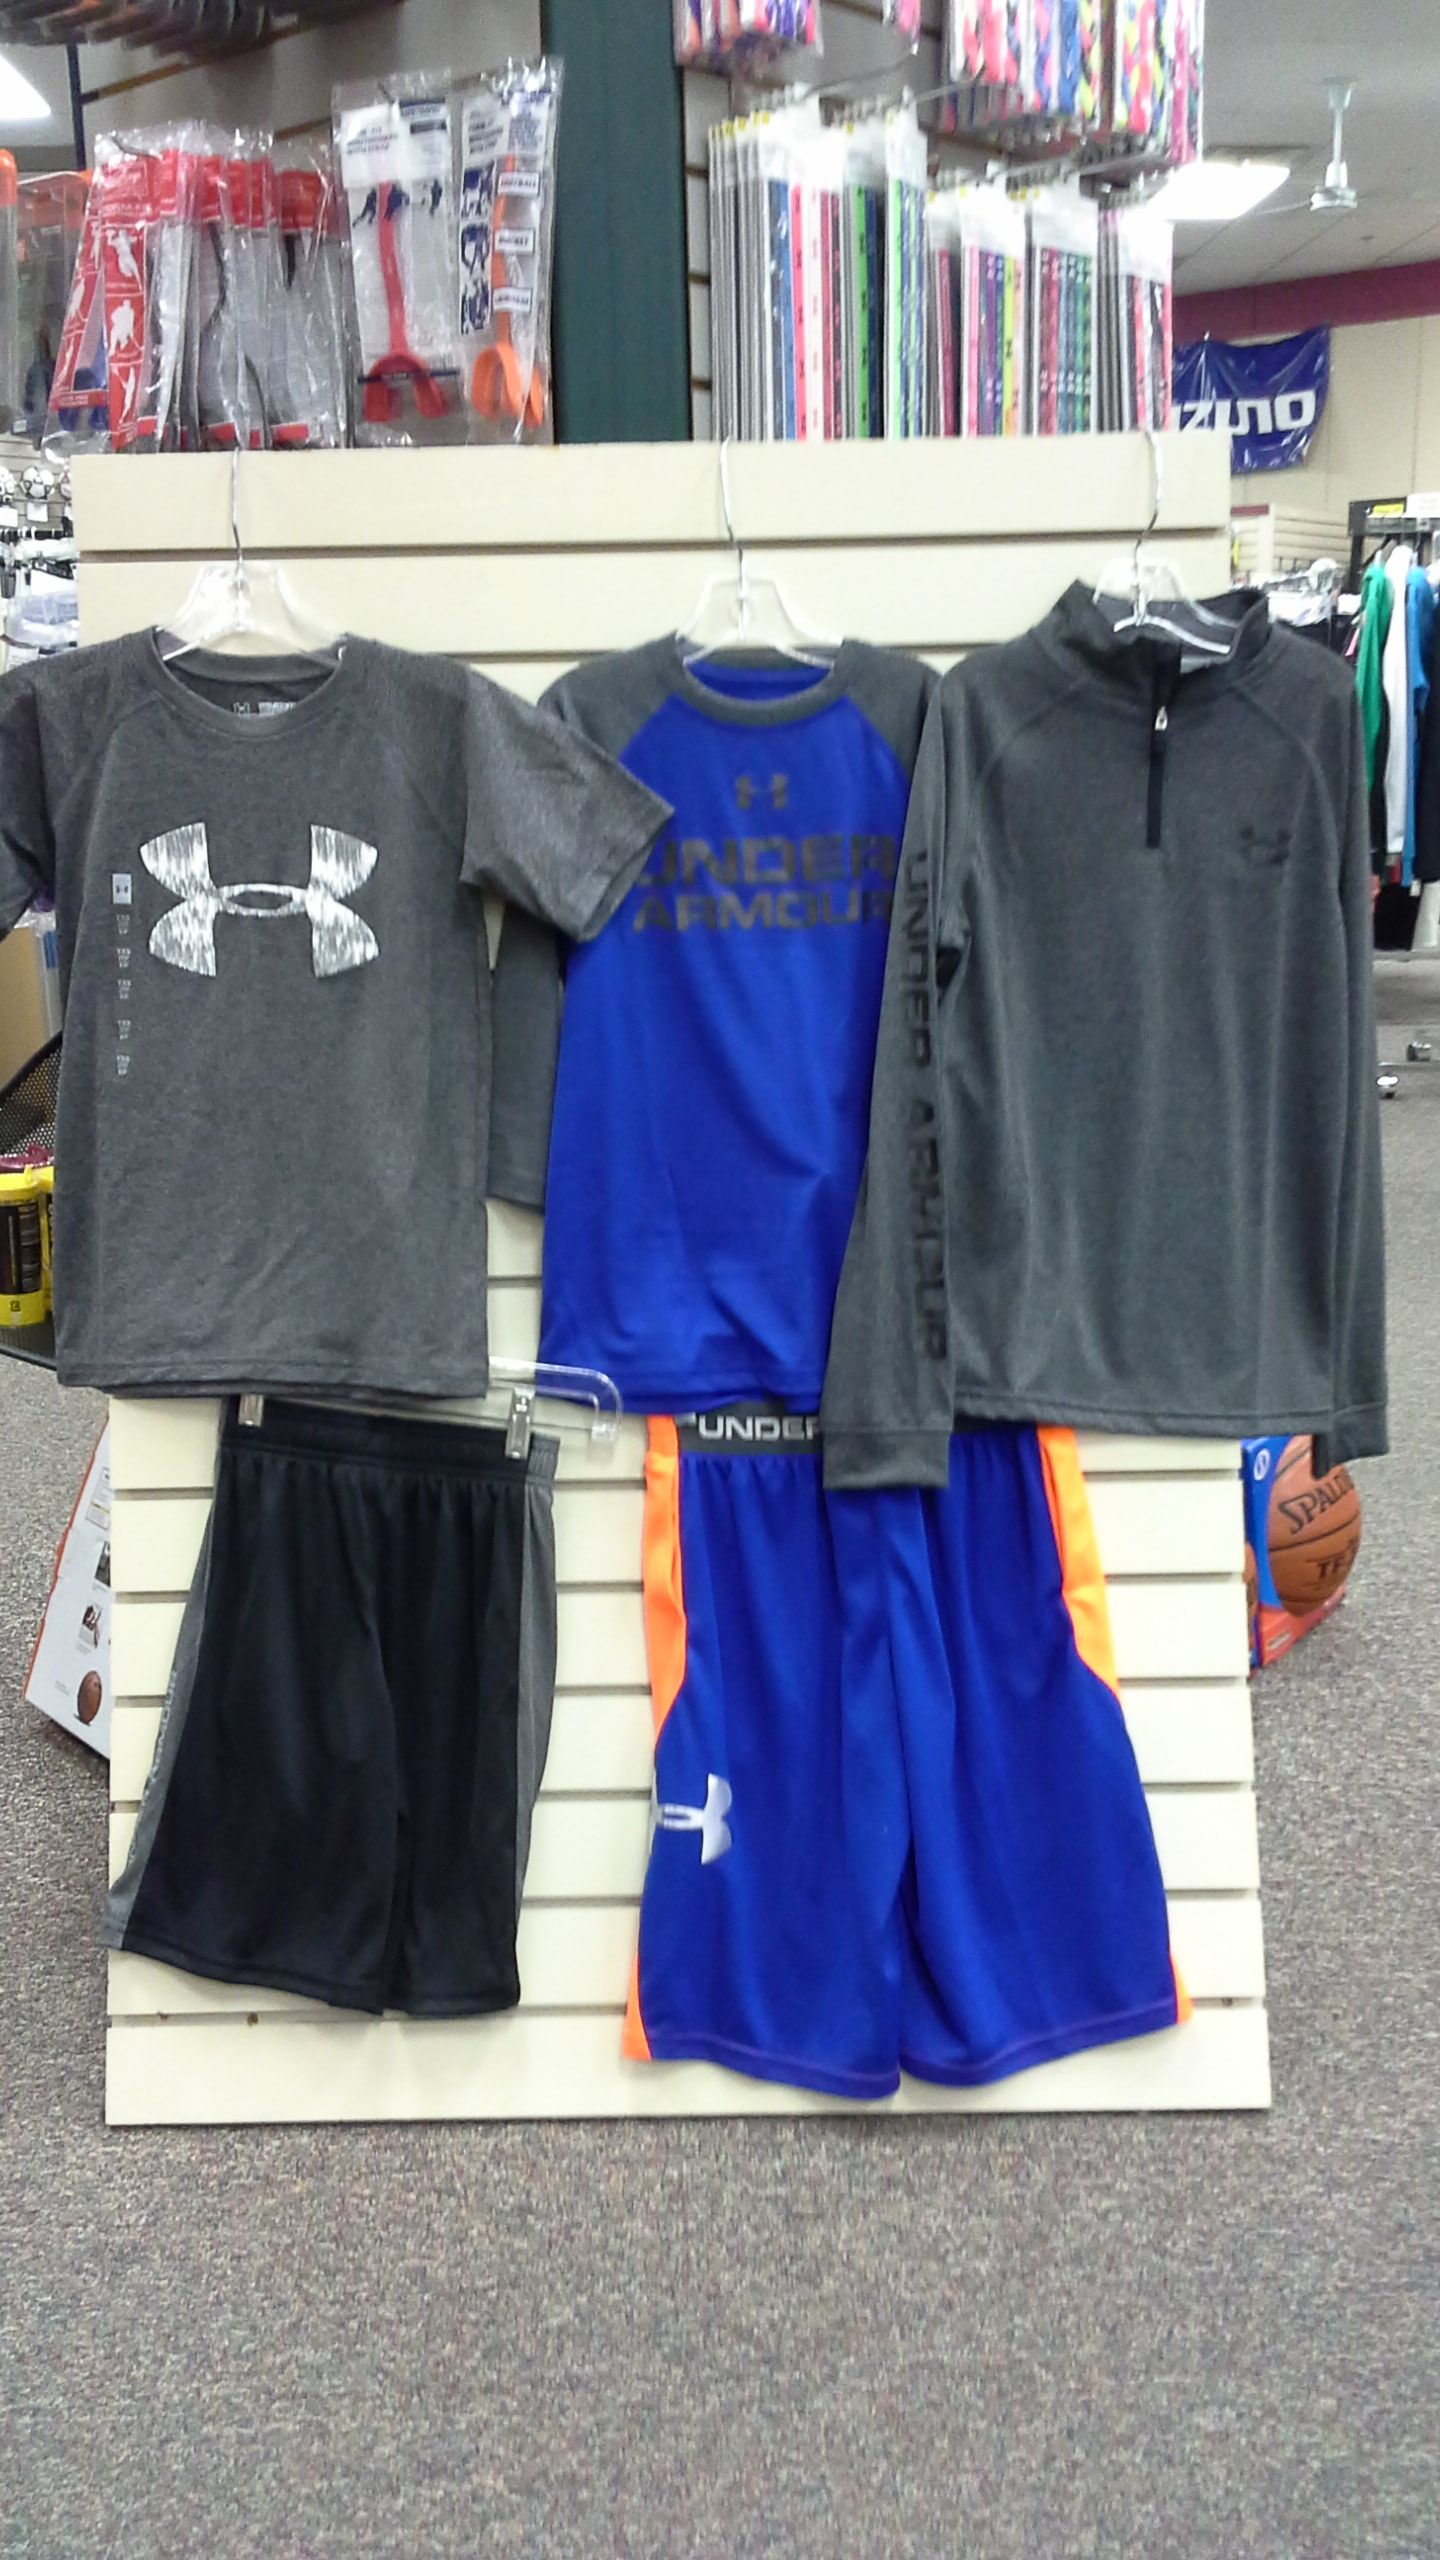 9fea68f20 Youth boys' Under Armour clothing, boys' blue Under Amour shorts ...